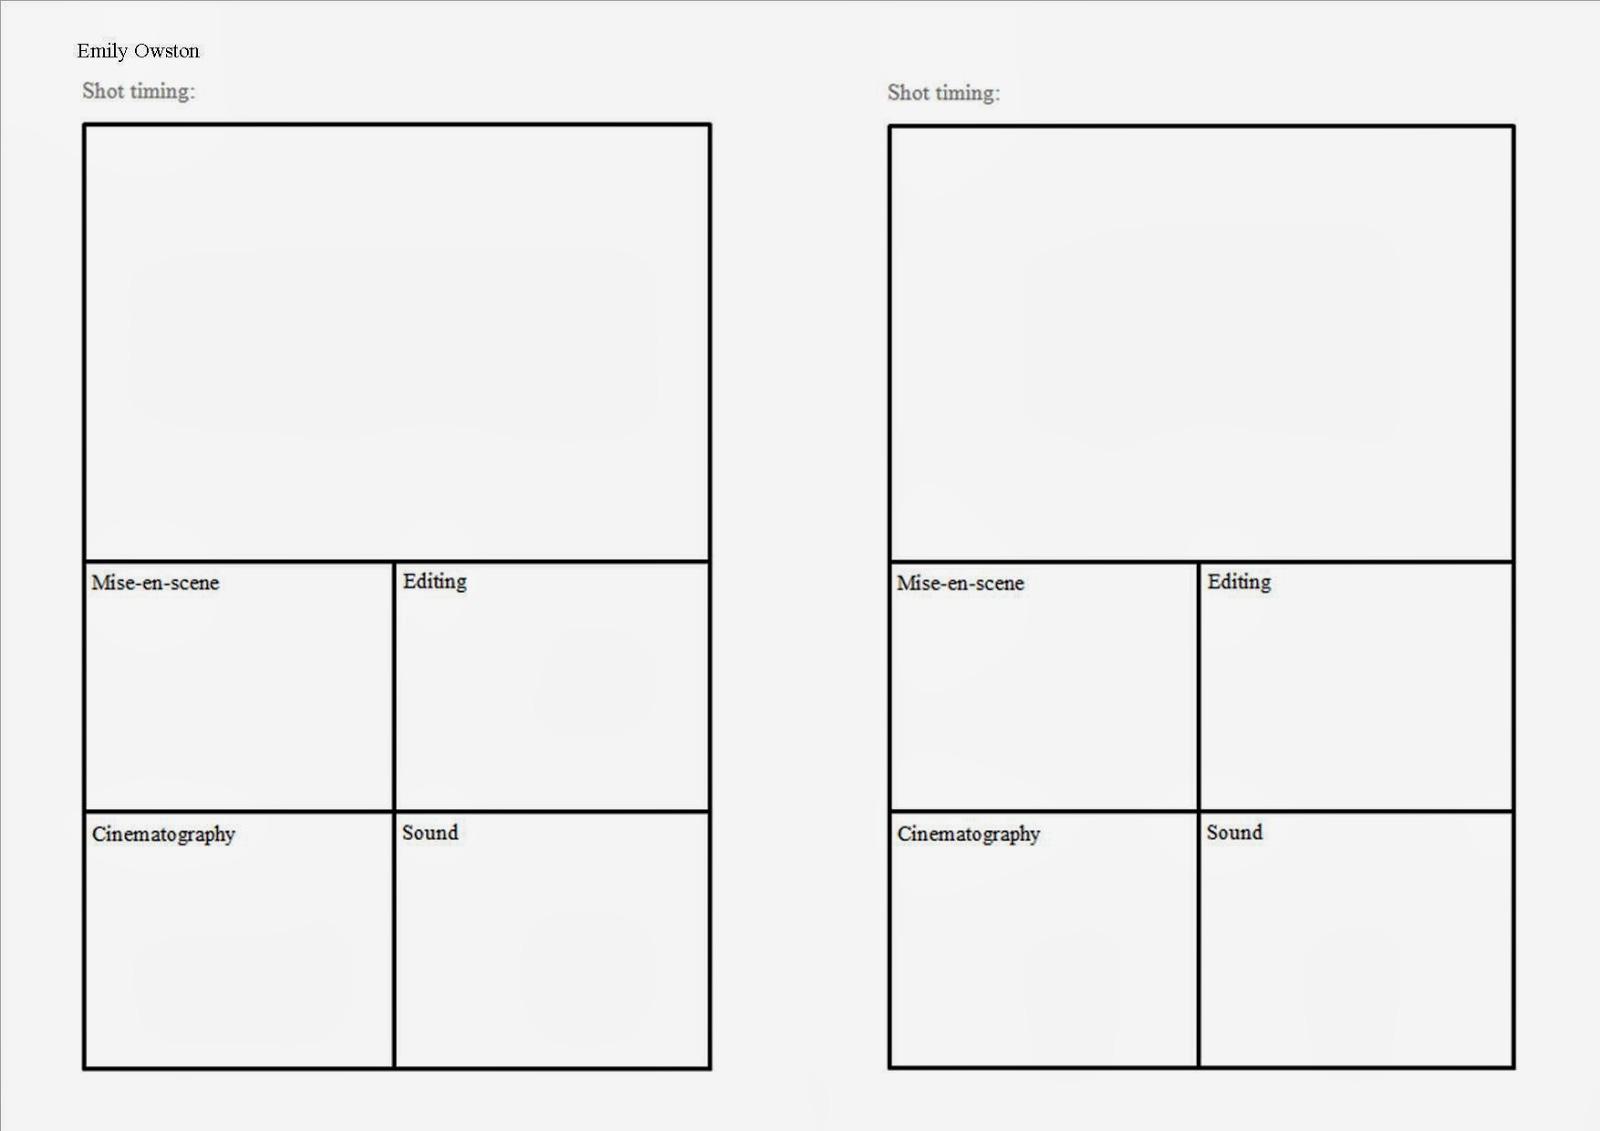 Erfreut Storyboard Vorlage Ks1 Fotos - Entry Level Resume Vorlagen ...